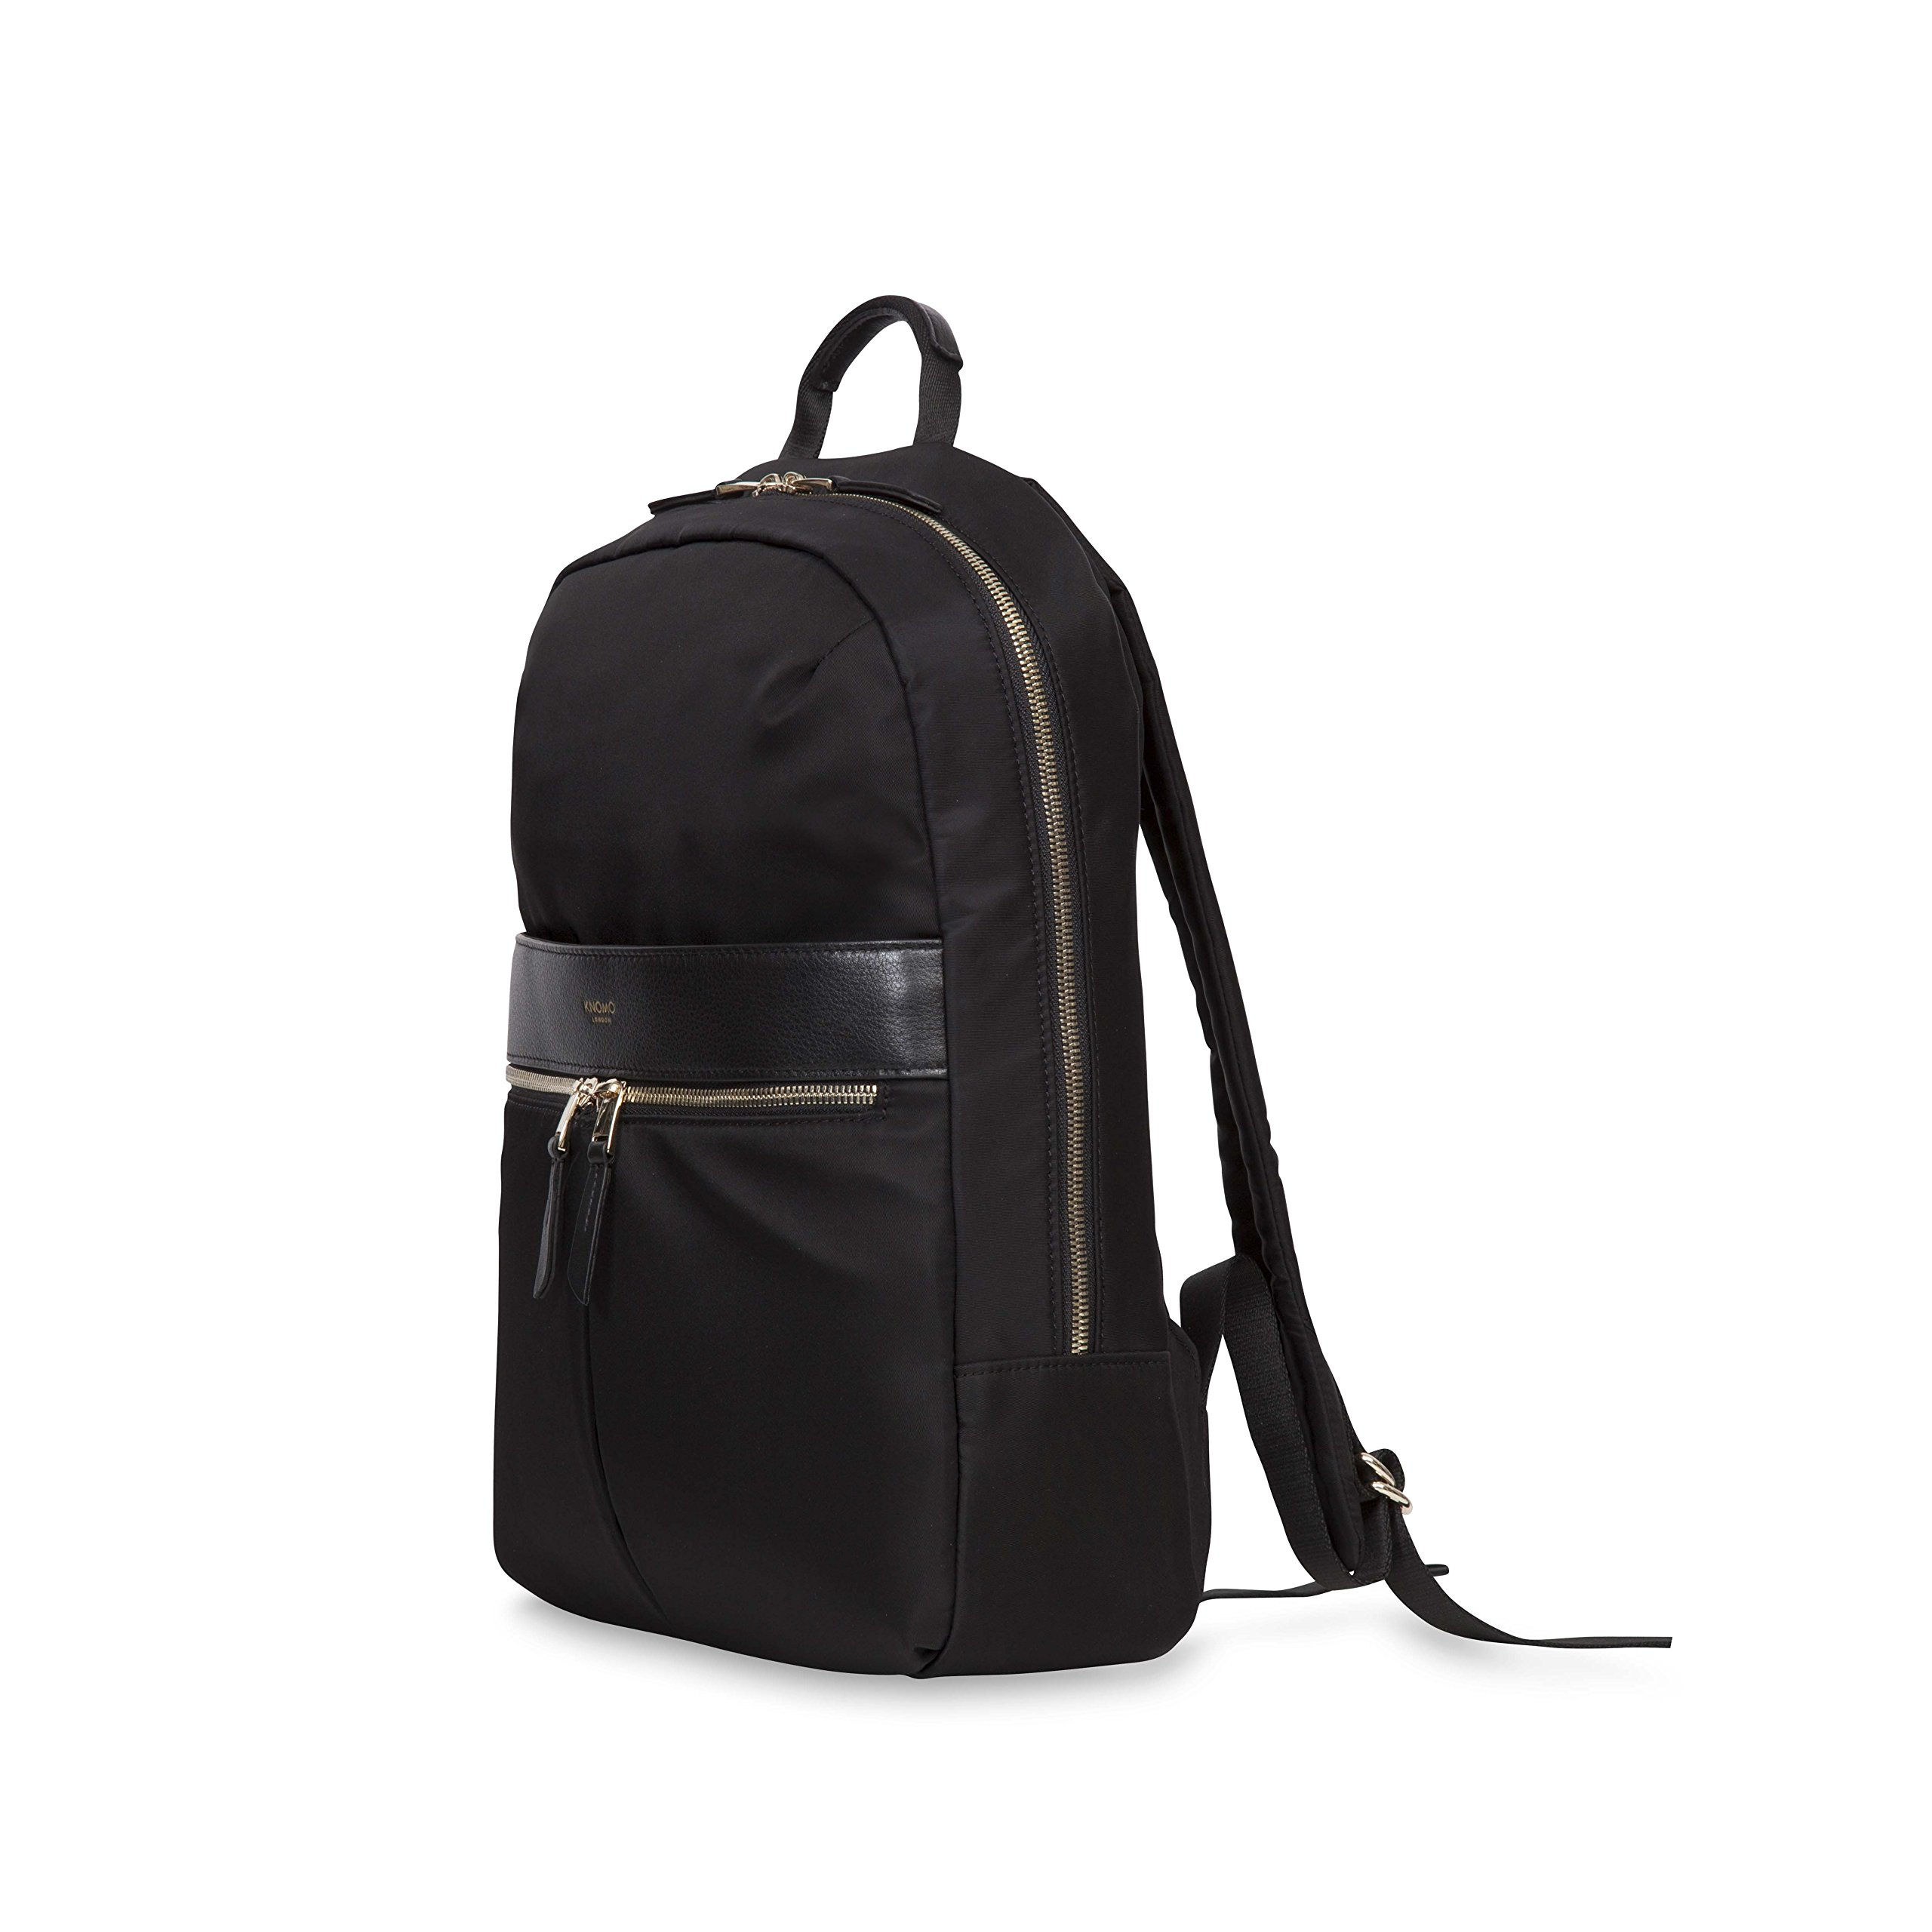 Knomo Luggage Women's Mayfair Nylon Beauchamp Backpack 14'', Black, One Size by Knomo